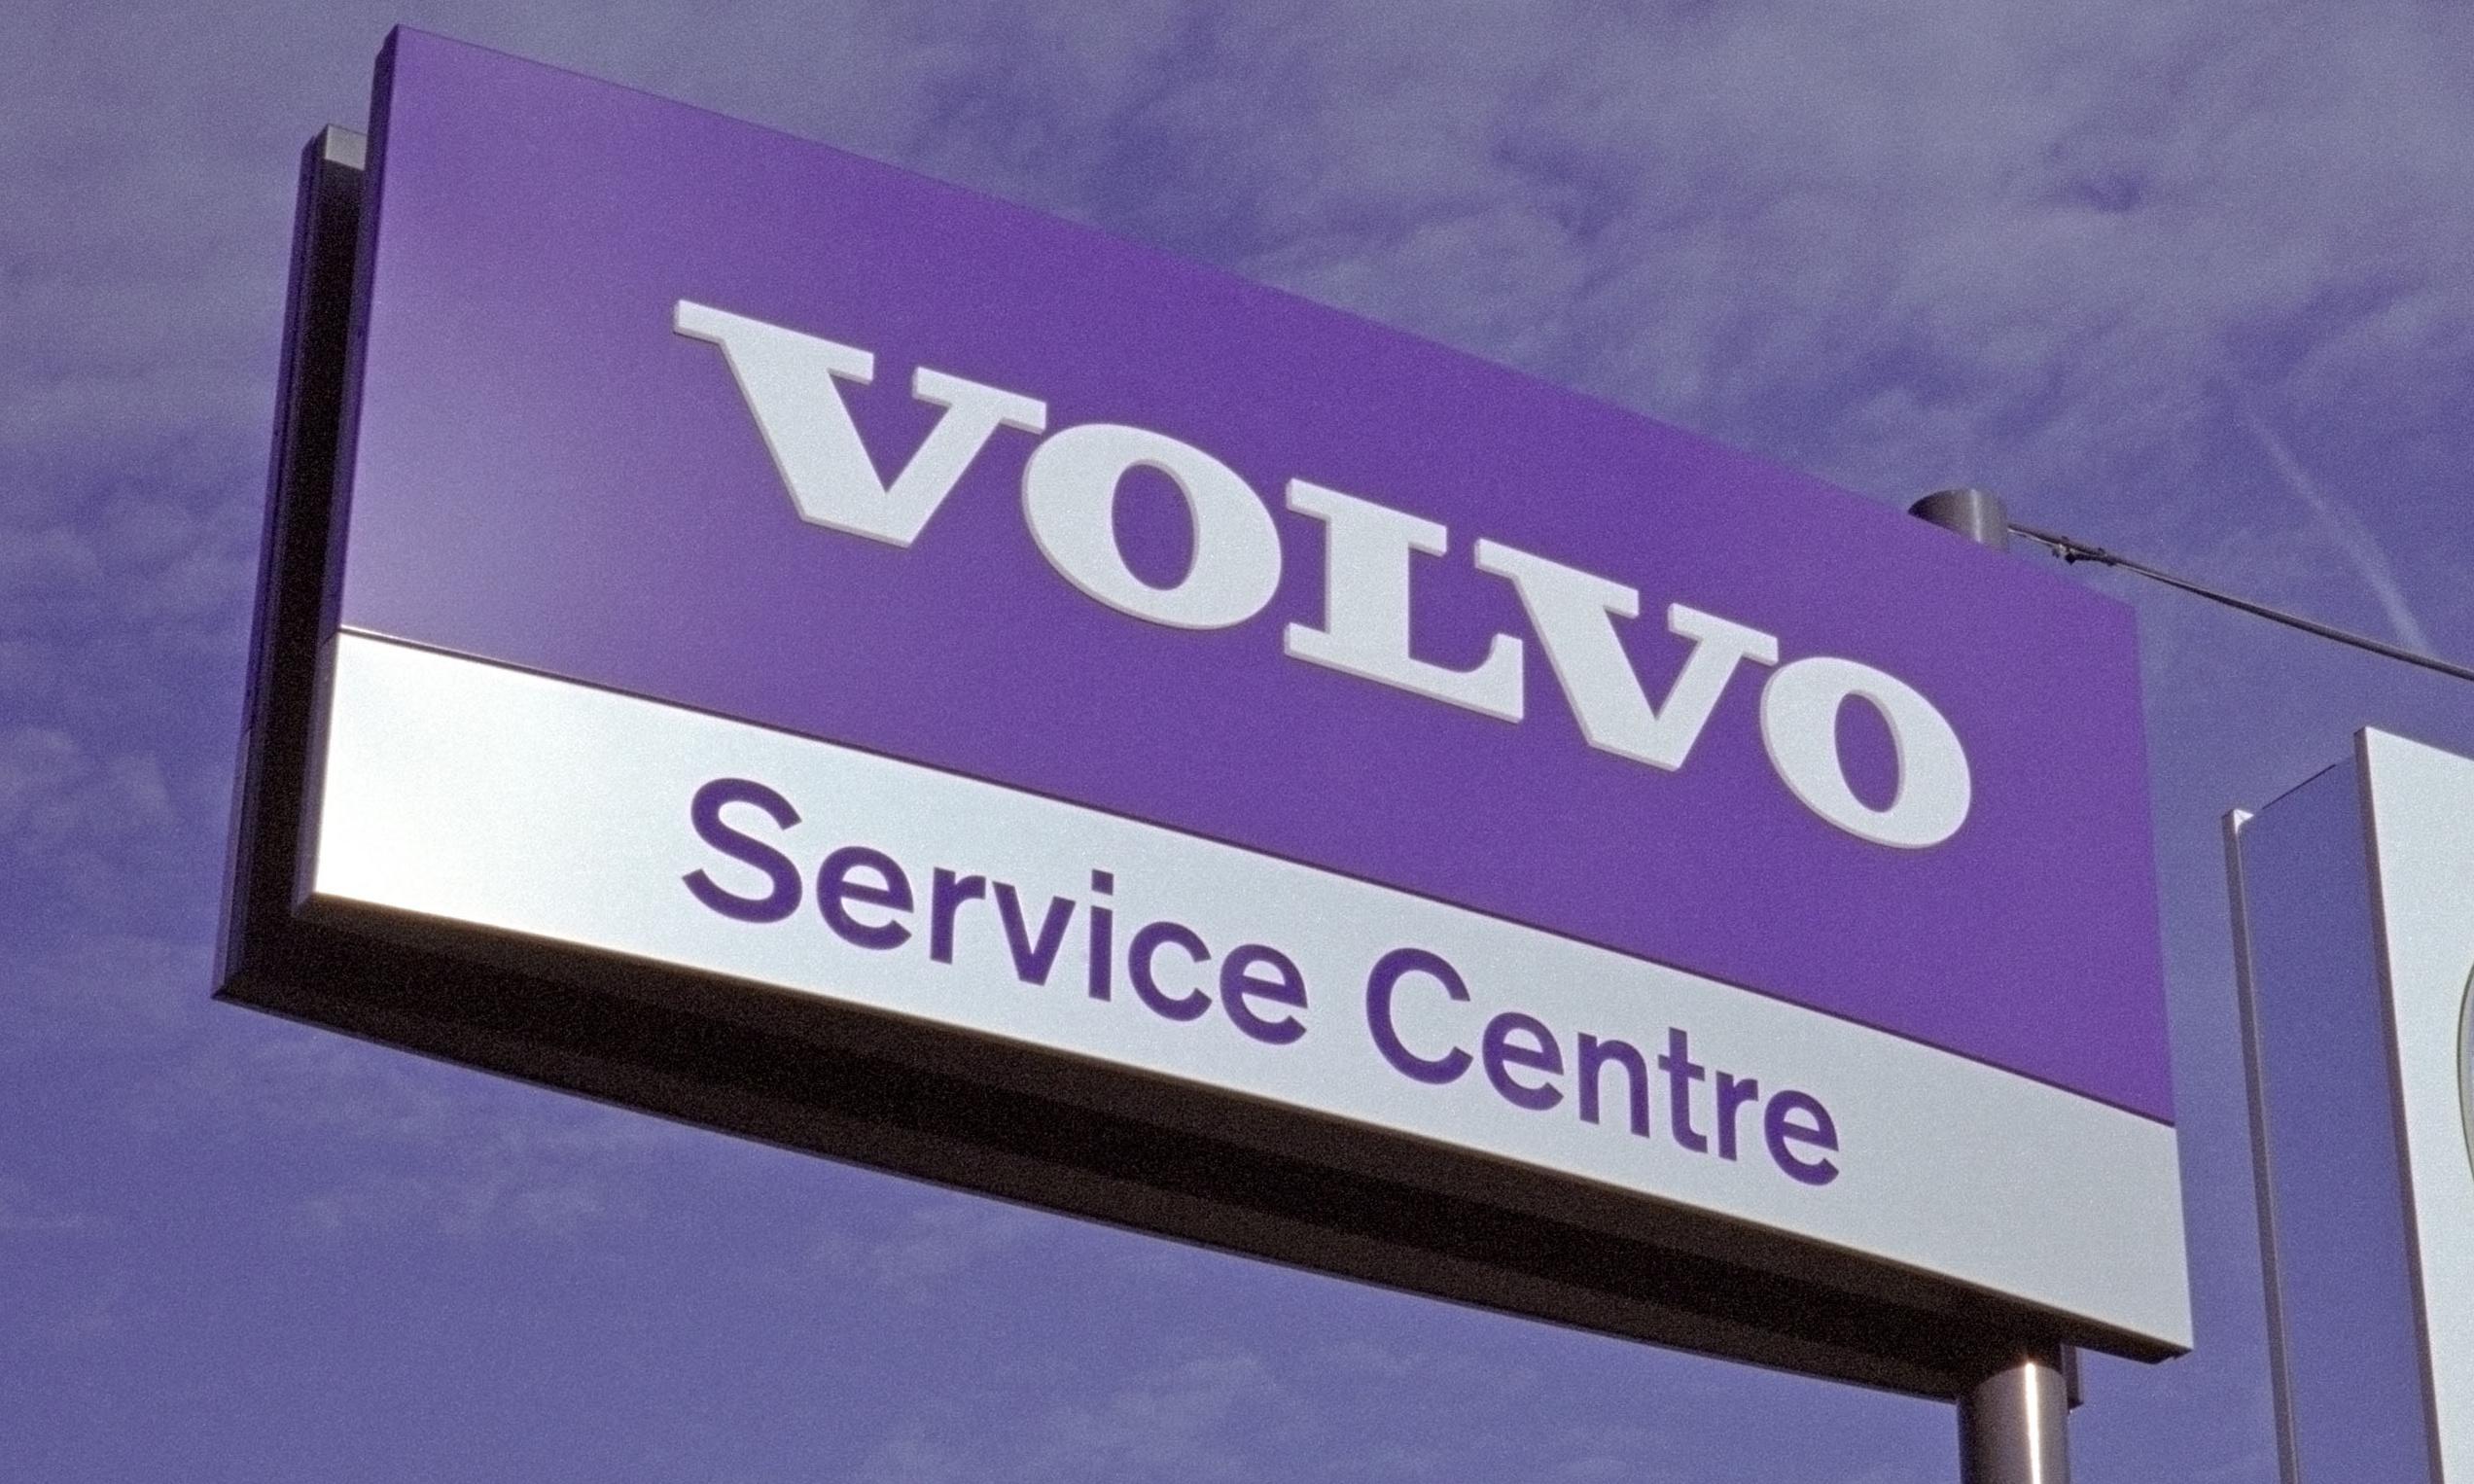 Volvo sent me a £10,000 repair bill for a three-year-old car